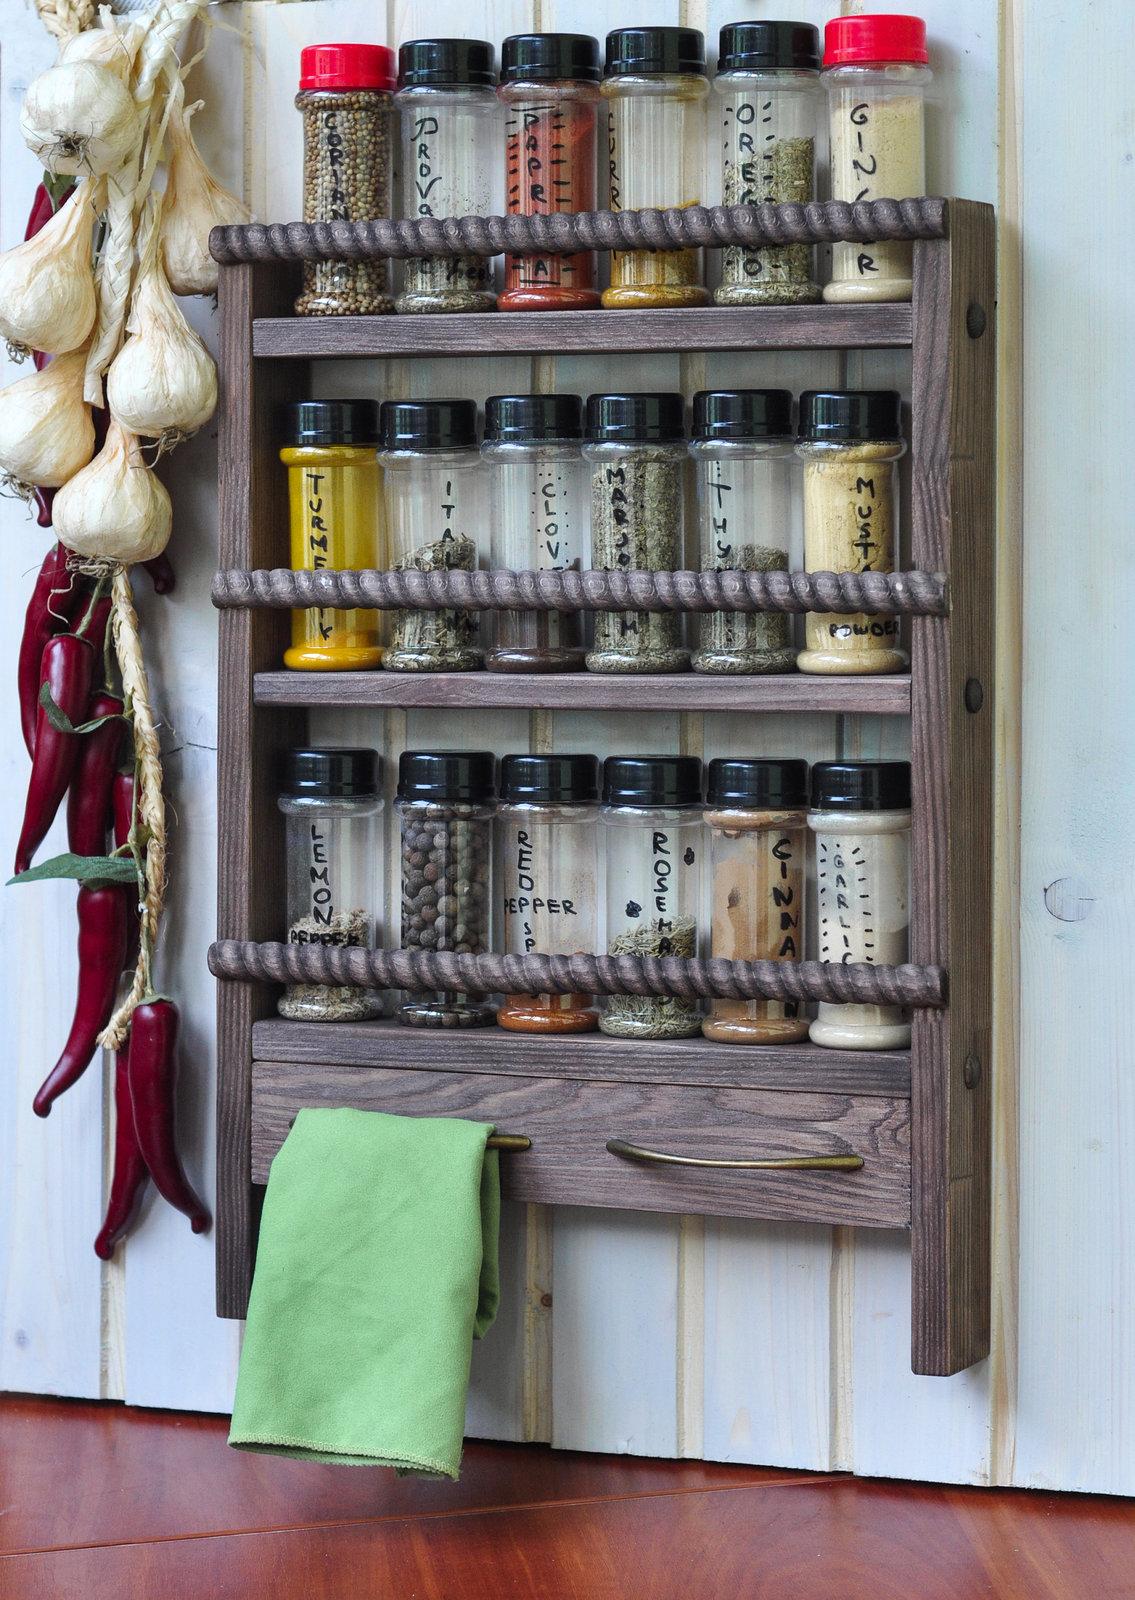 Wooden Spice Rack Wall Mount & Towel Holders - Oak Style finish, Rustic Rope Sty